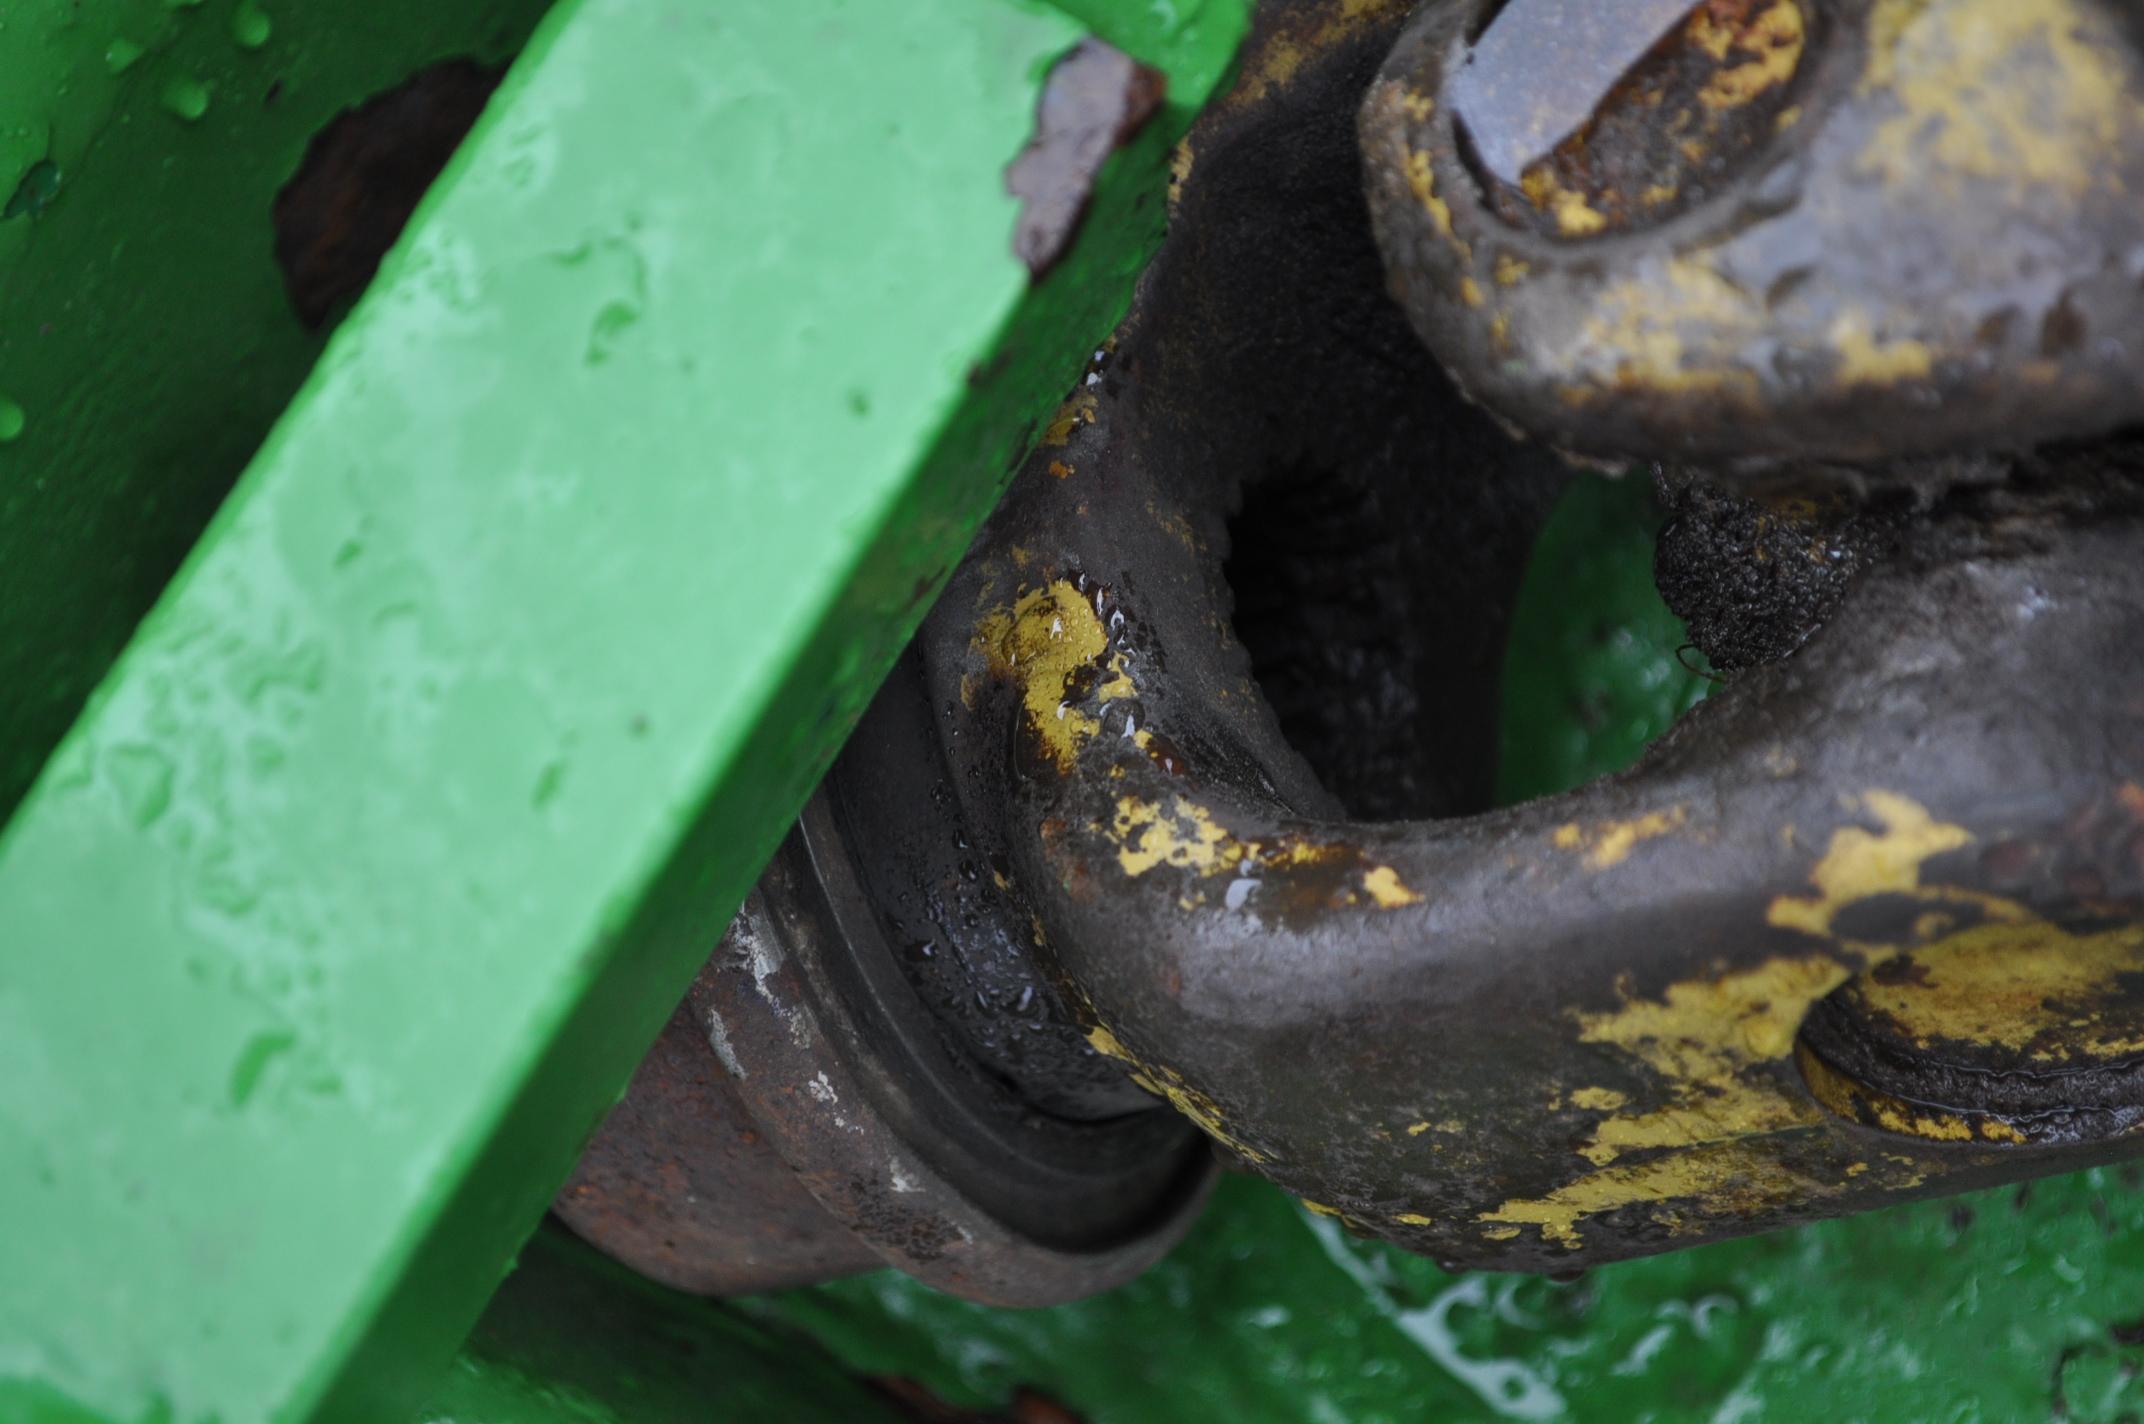 15' John Deere 1508 rotary mower, hyd fold, 1000 pto - Image 6 of 13